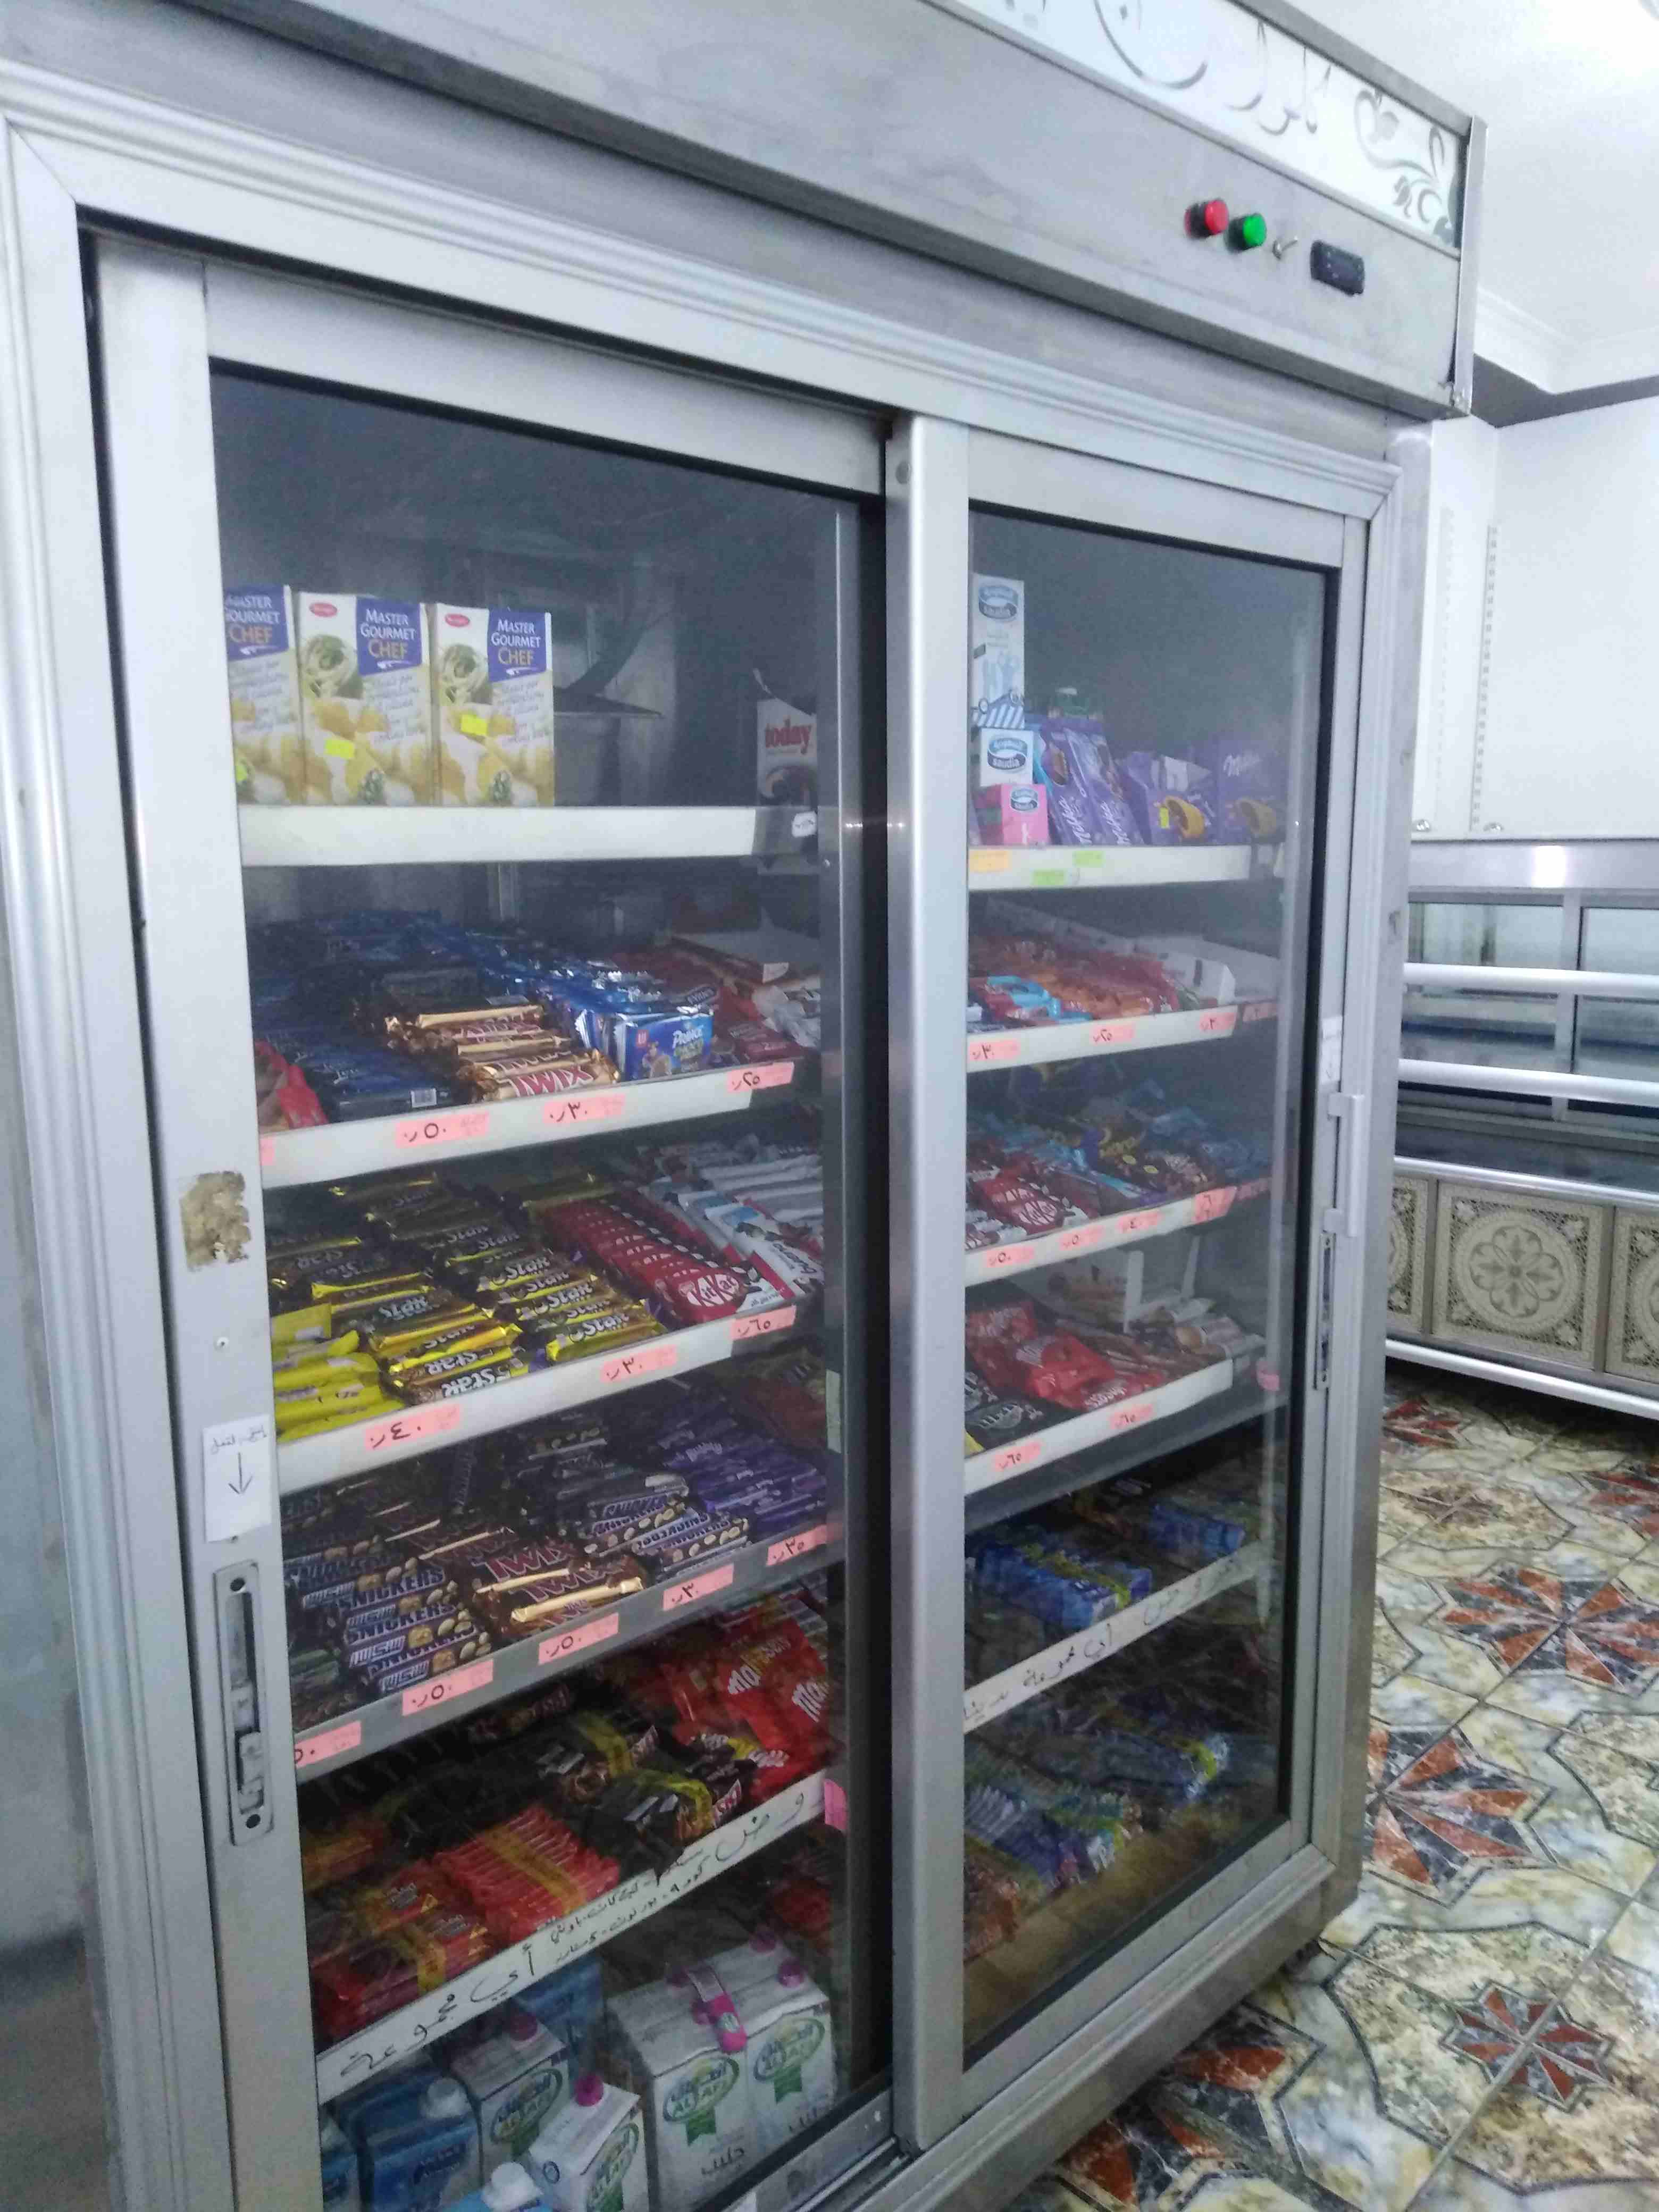 Hitachi latest model fridge with 2 doors up and down-  ثلاجة عرض ستانلس بابين...